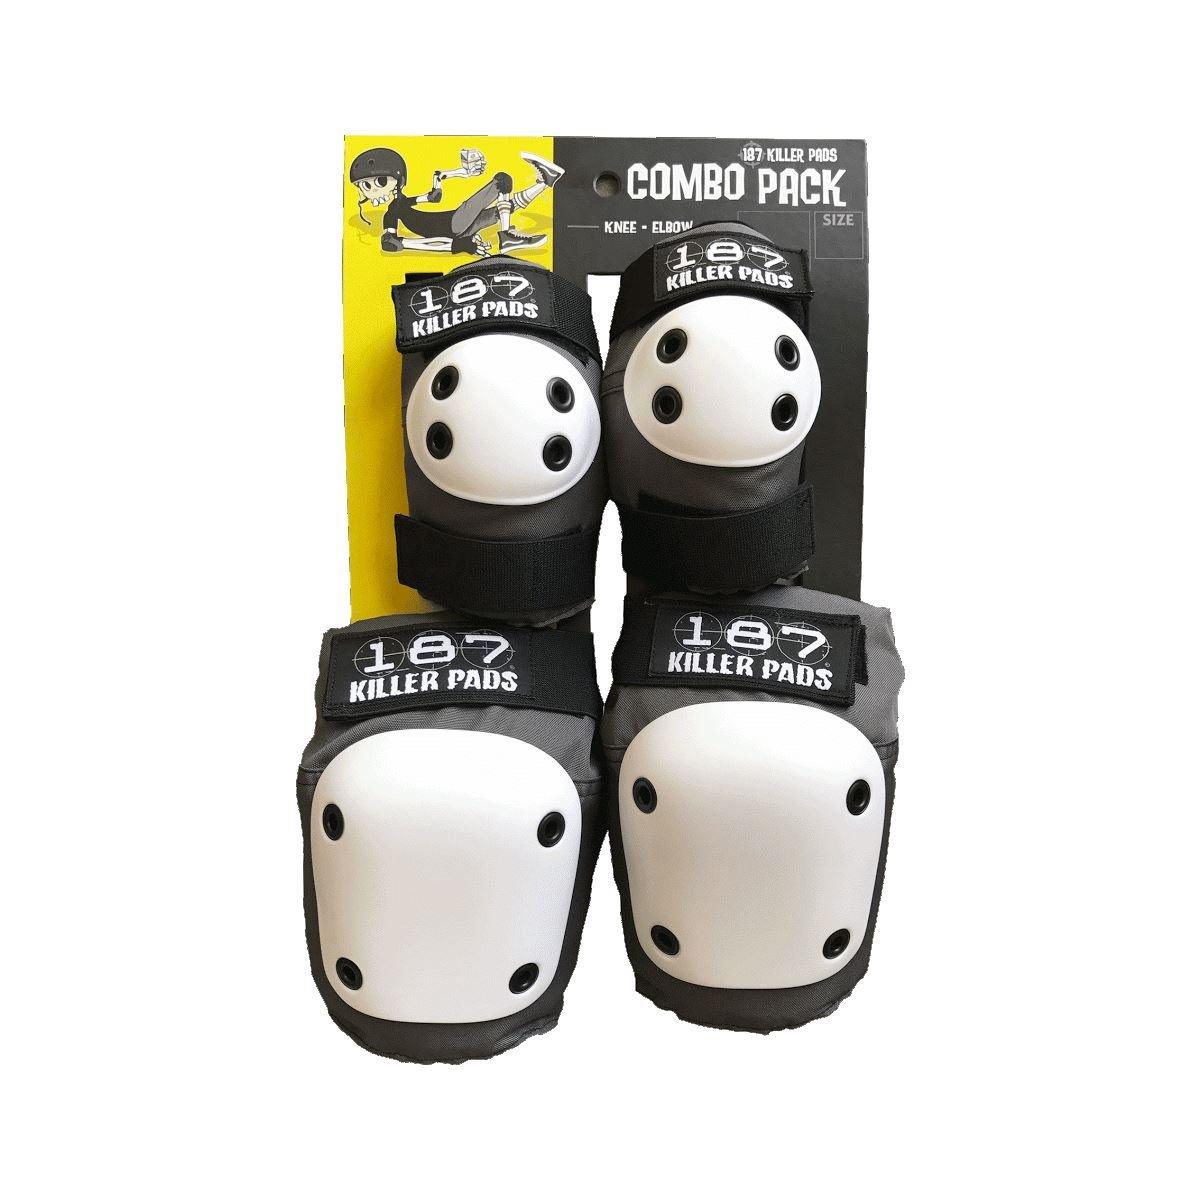 187 Killer Pads Combo Pack Grey (Grey, XS)